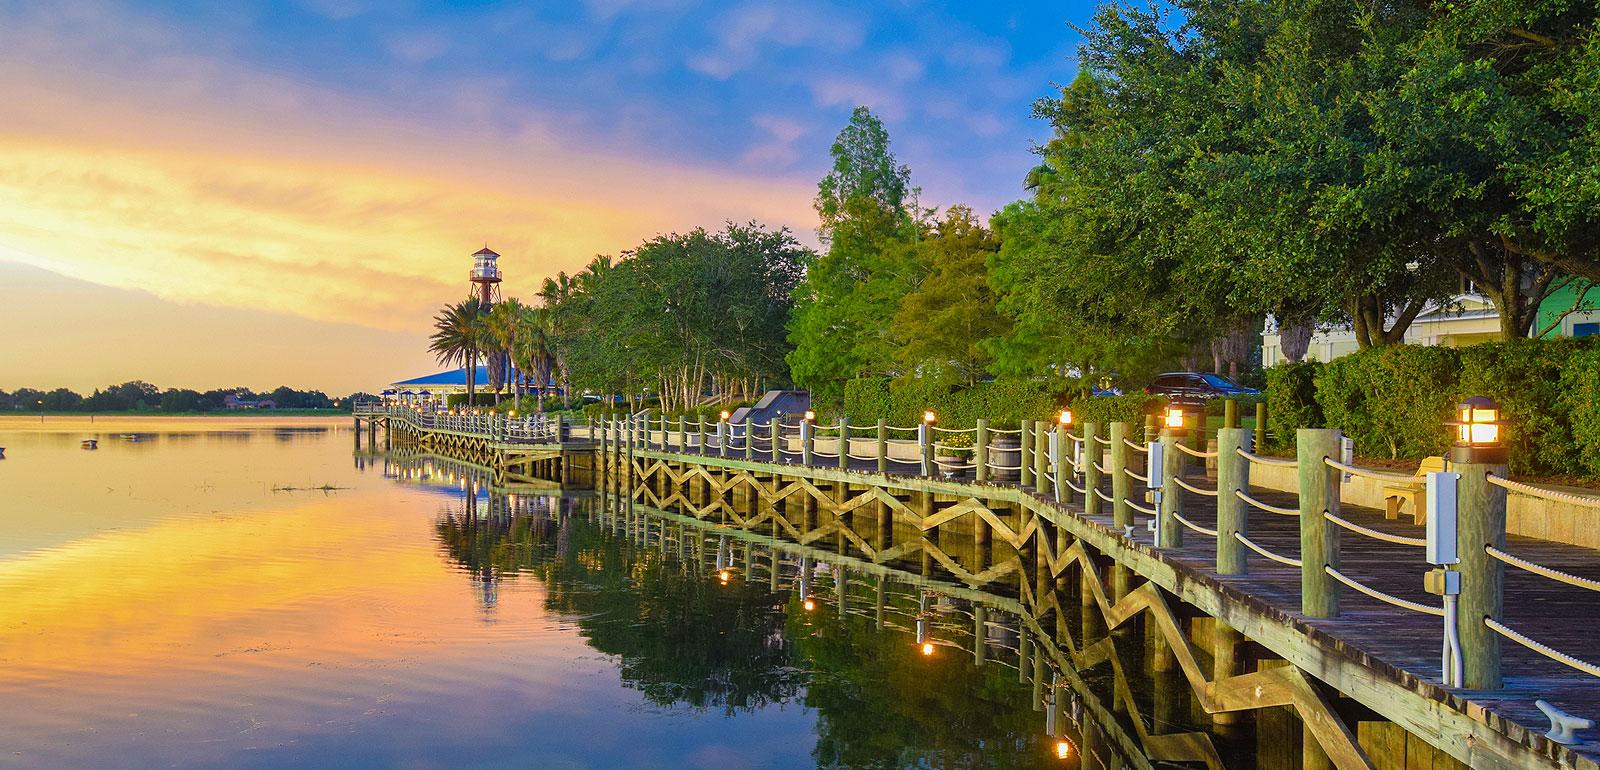 beautiful sunset in Ruskin, FL